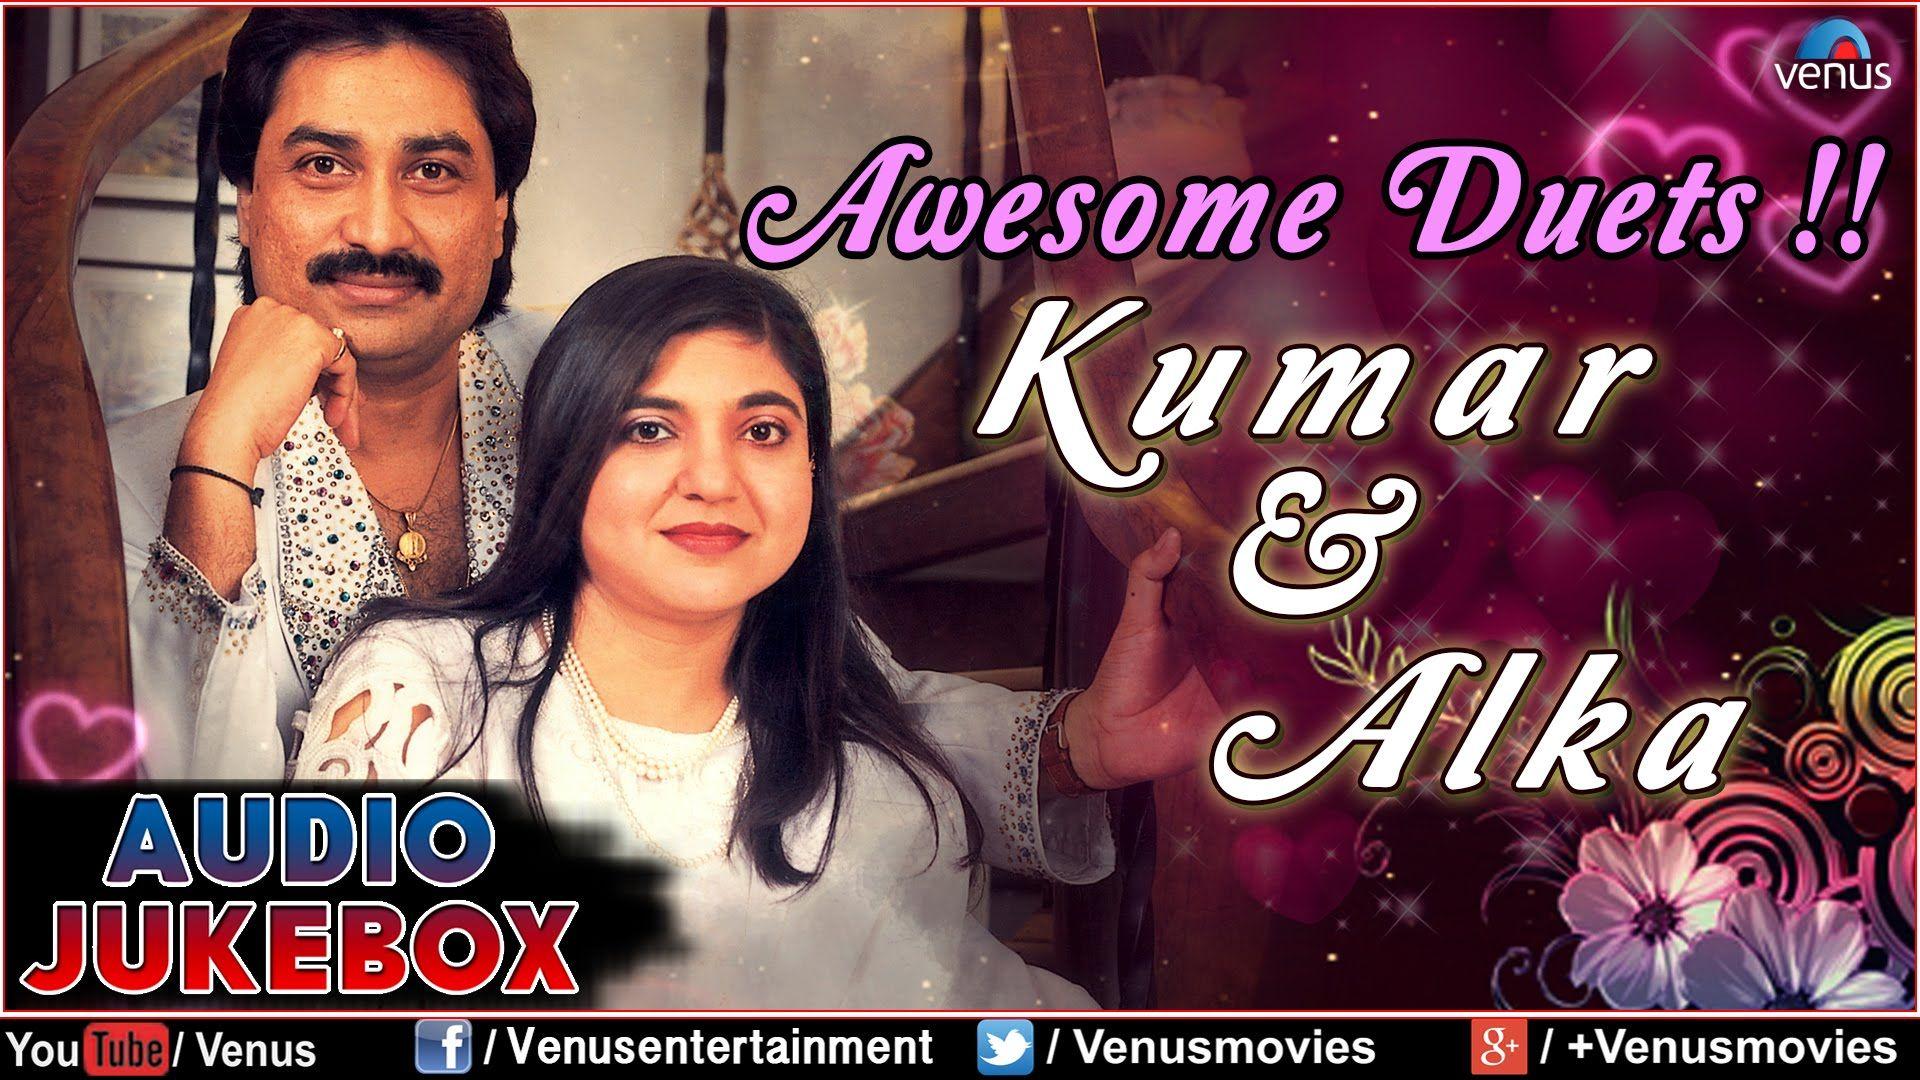 awesome Awesome Duets : Kumar Sanu & Alka Yagnik ~ Romantic Hits    Audio Jukebox